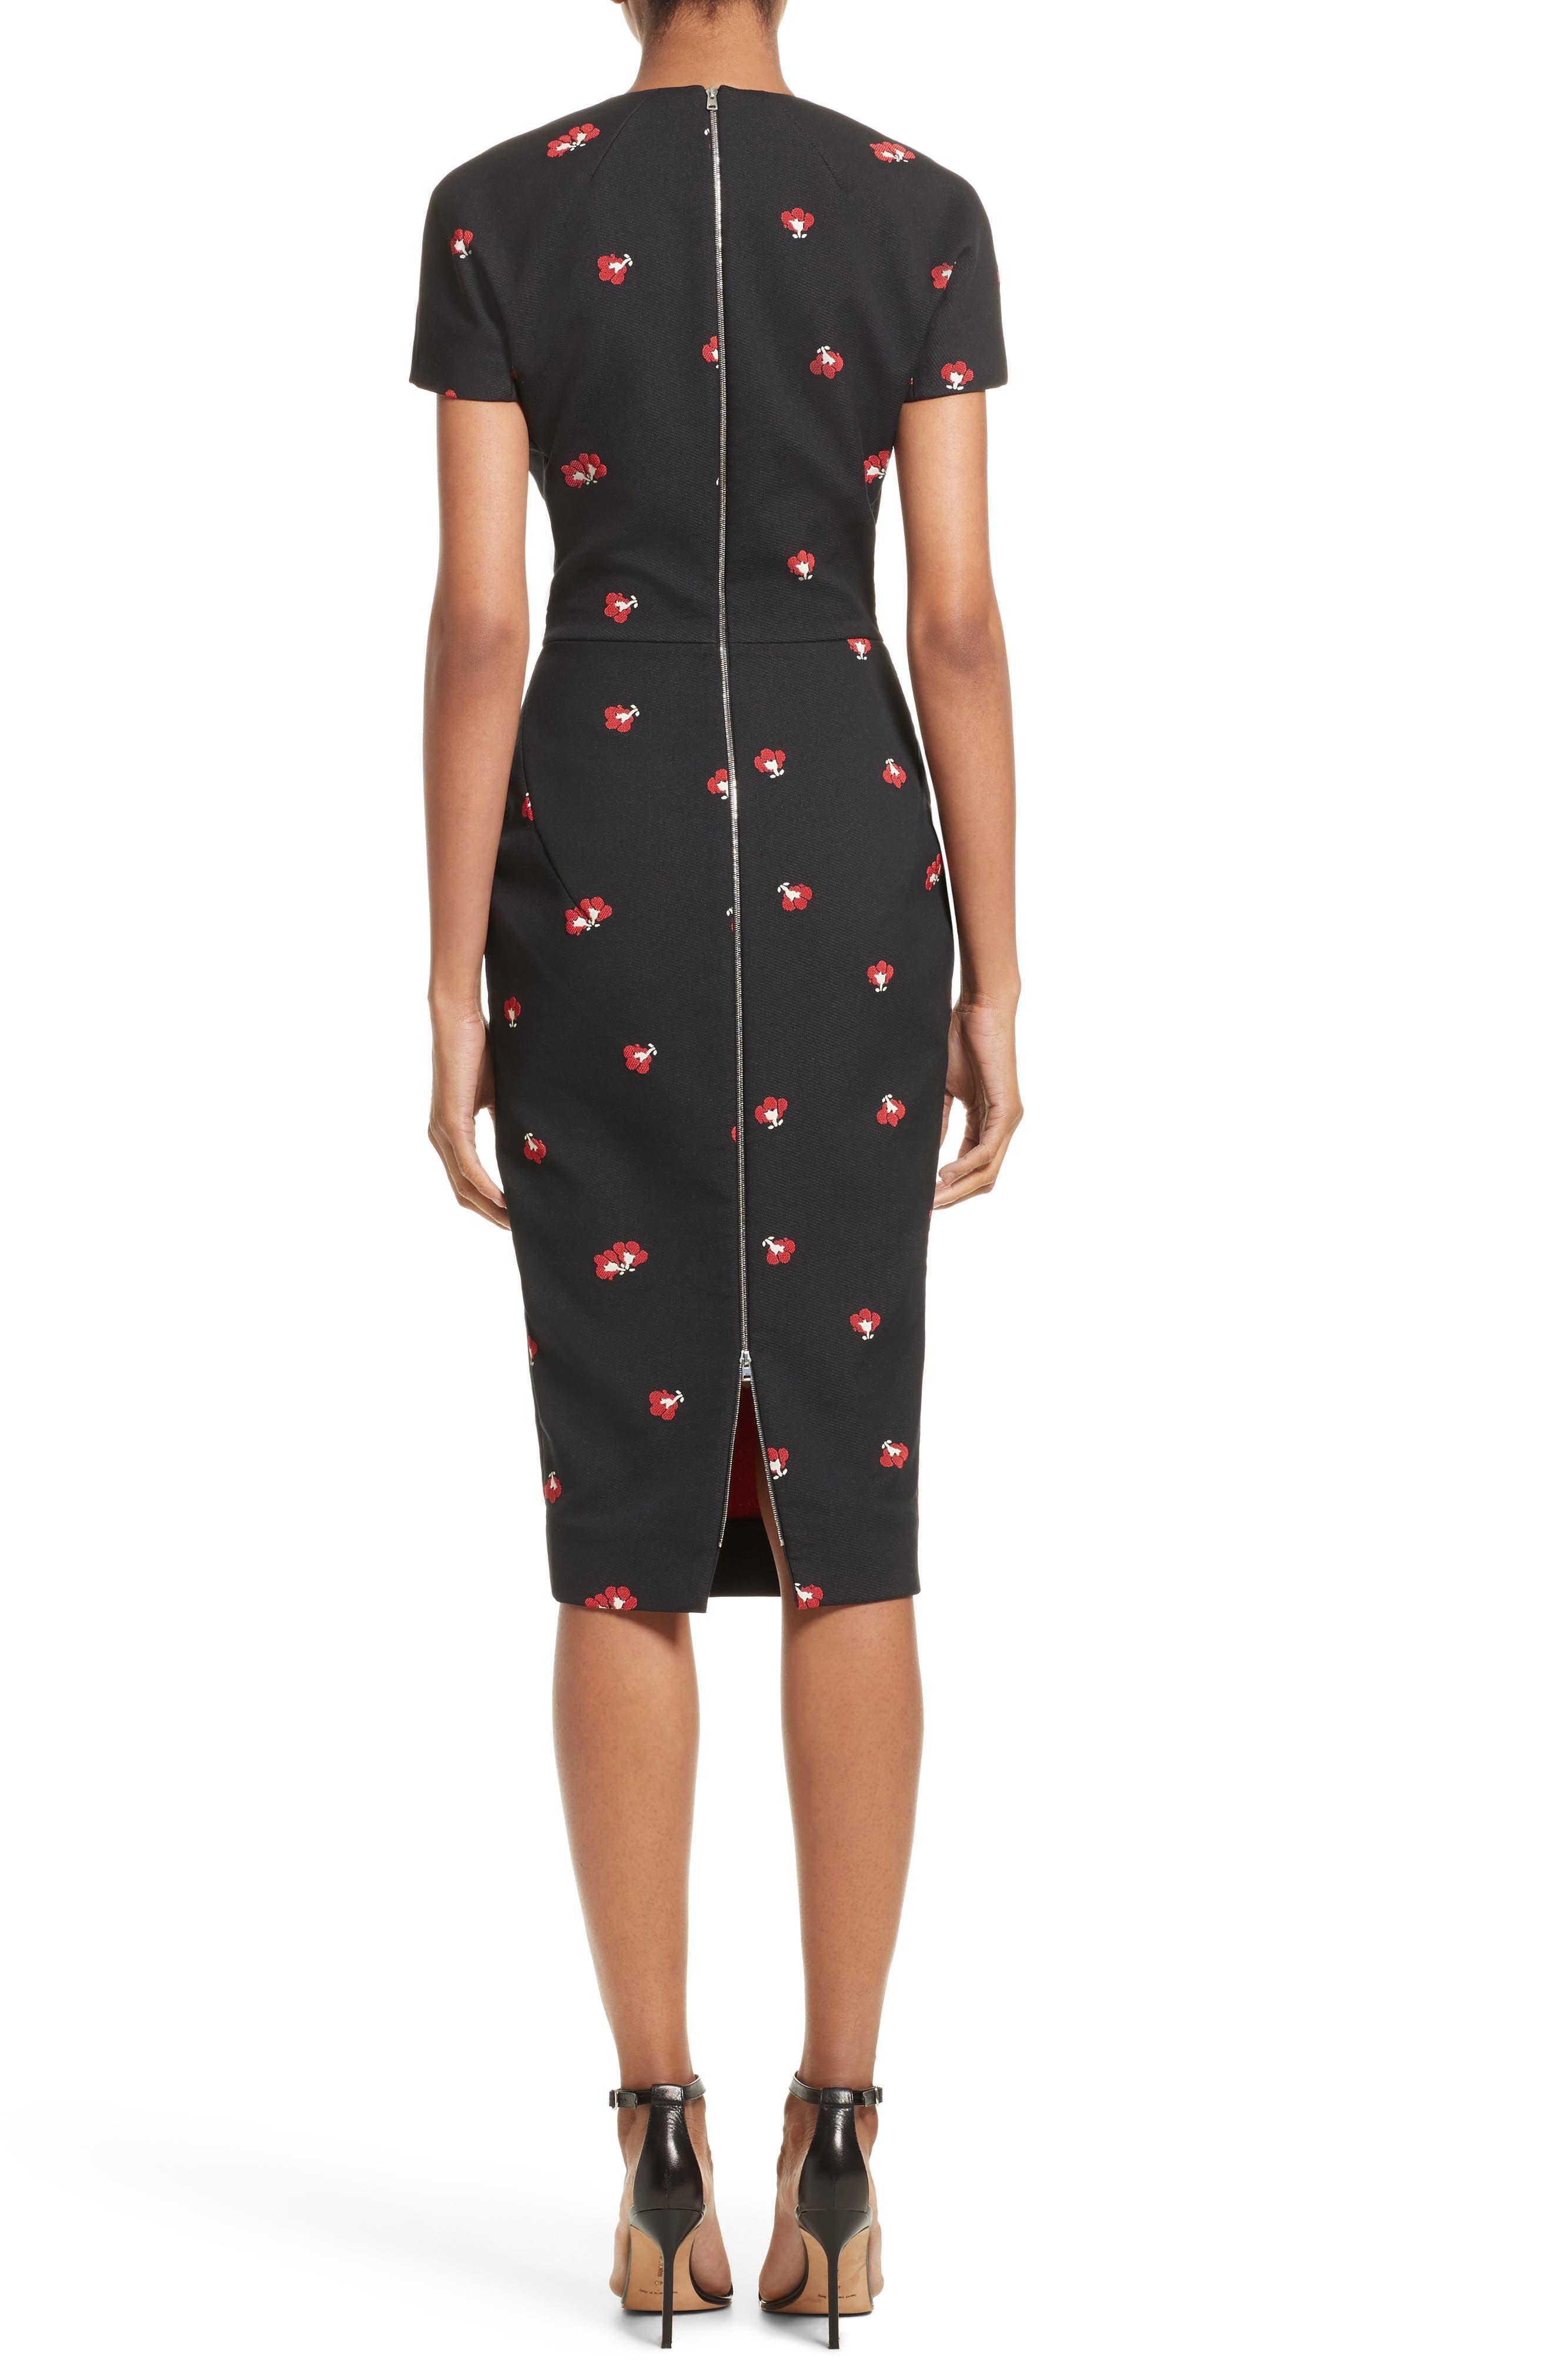 Flower Print Pencil Dress,                             Alternate thumbnail 2, color,                             Black/ Red